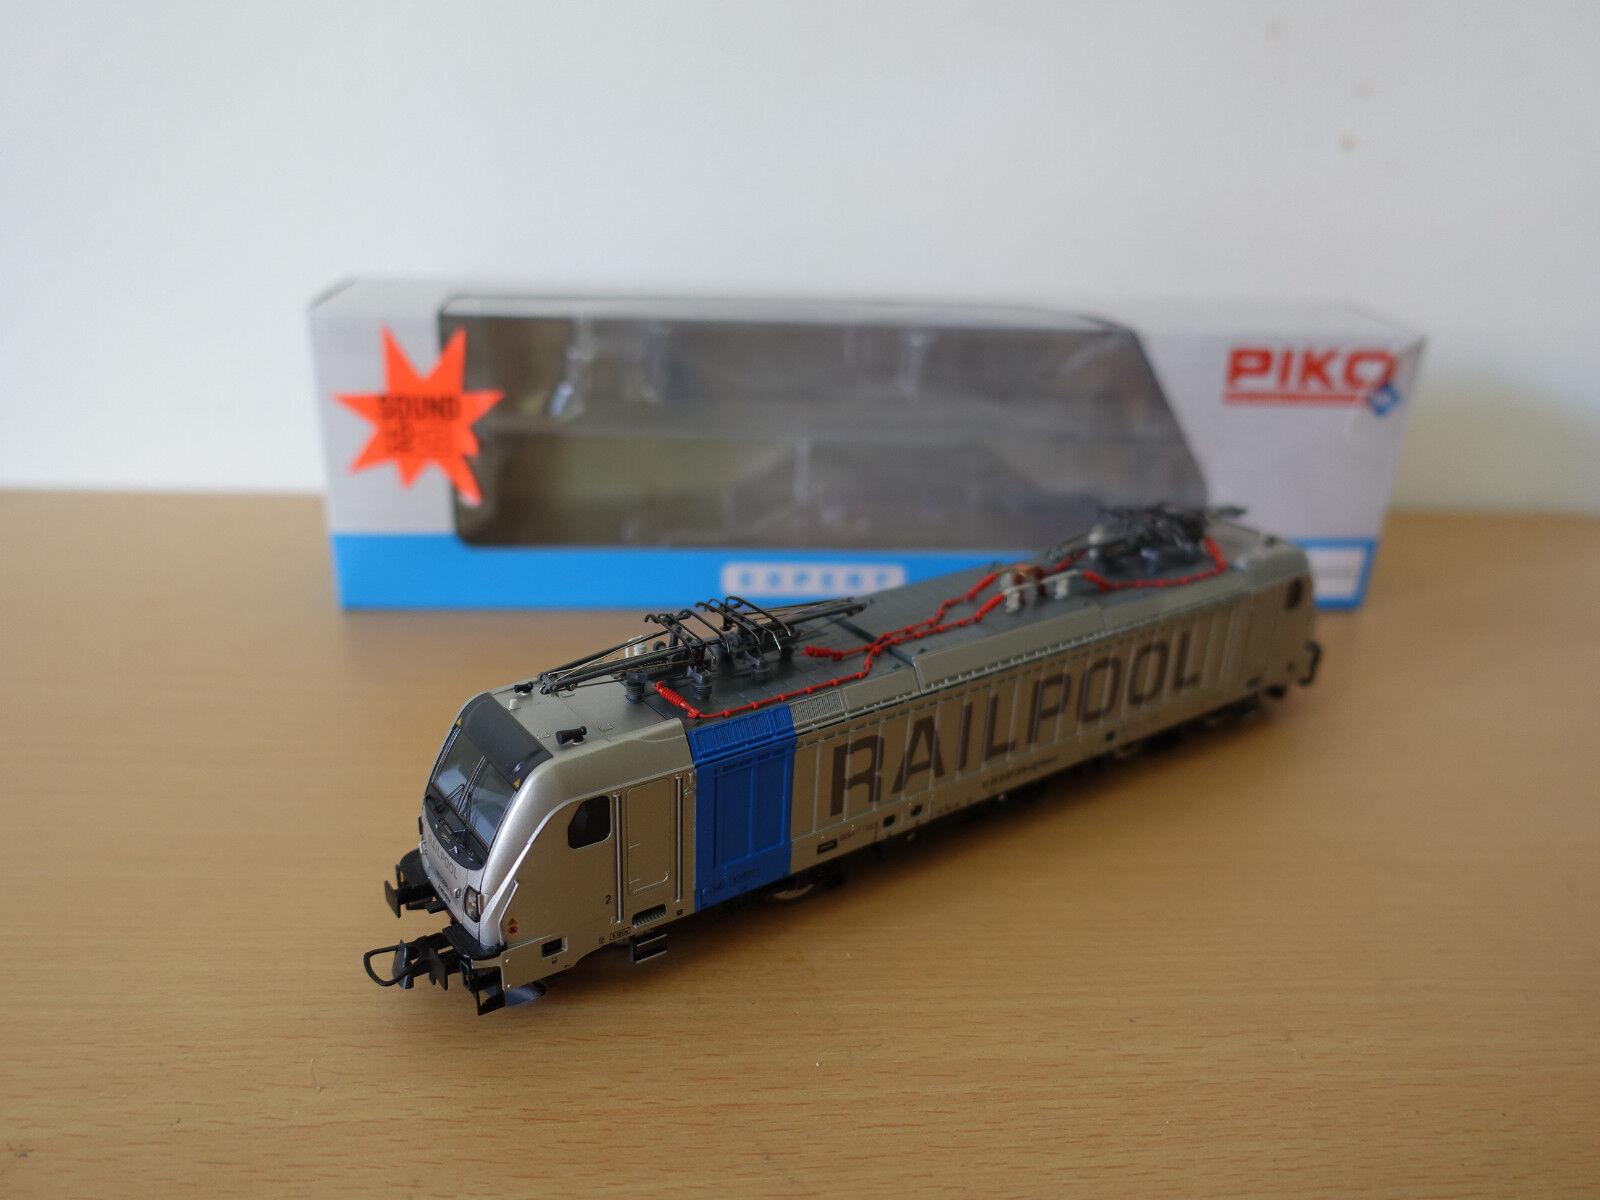 Piko Expert 51564-3 e-Lok br187 railpool PE vi con esu Sound de fábrica